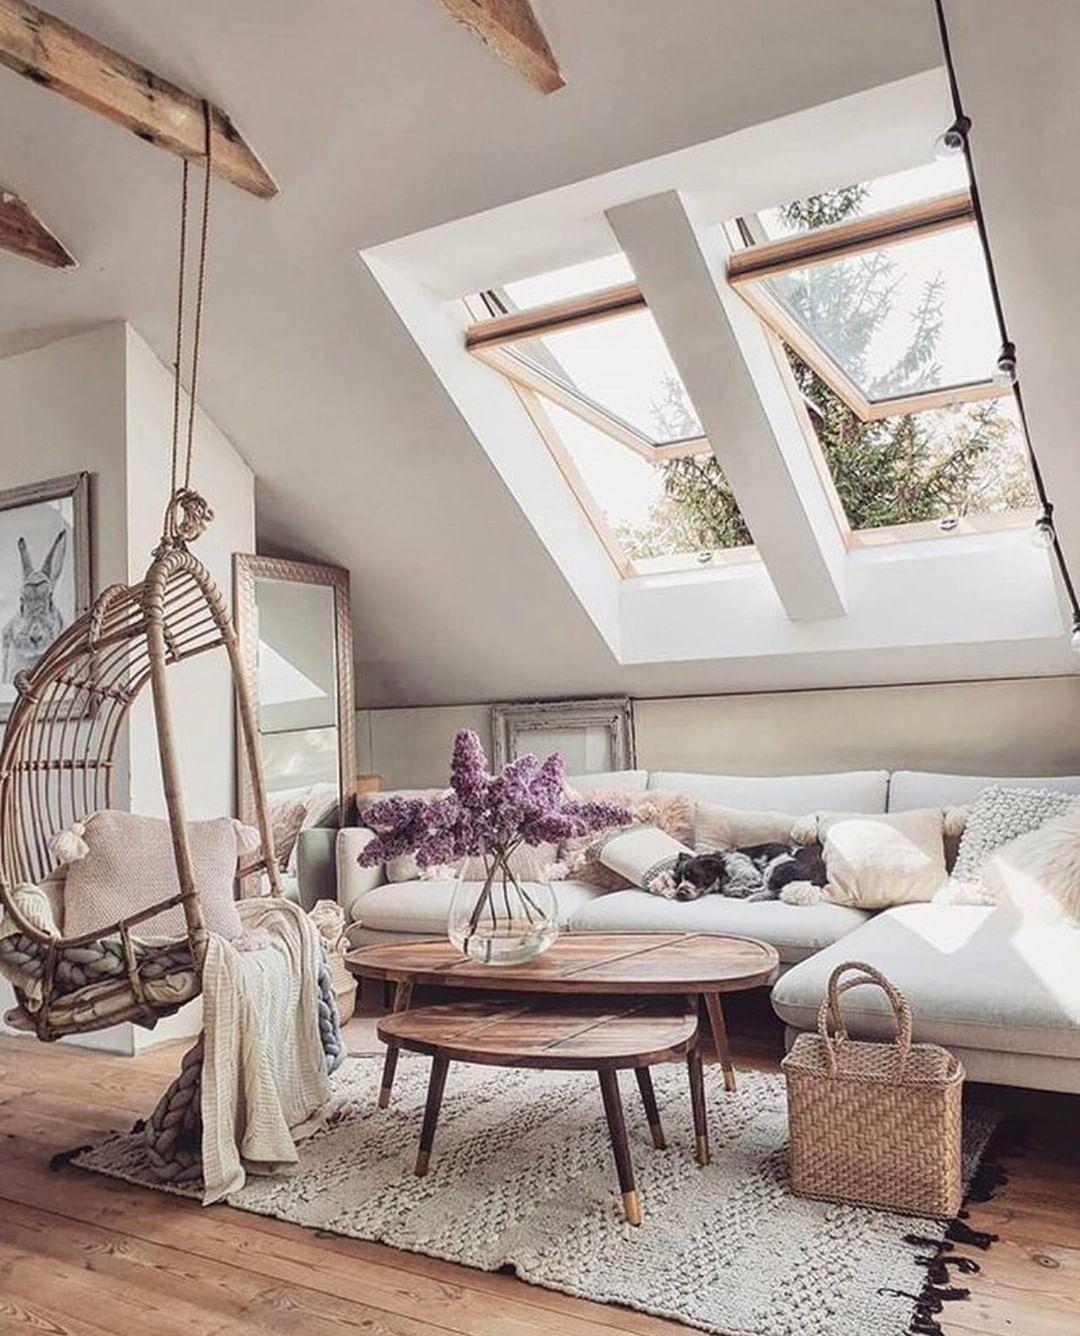 interior decor trends 2020 (15)